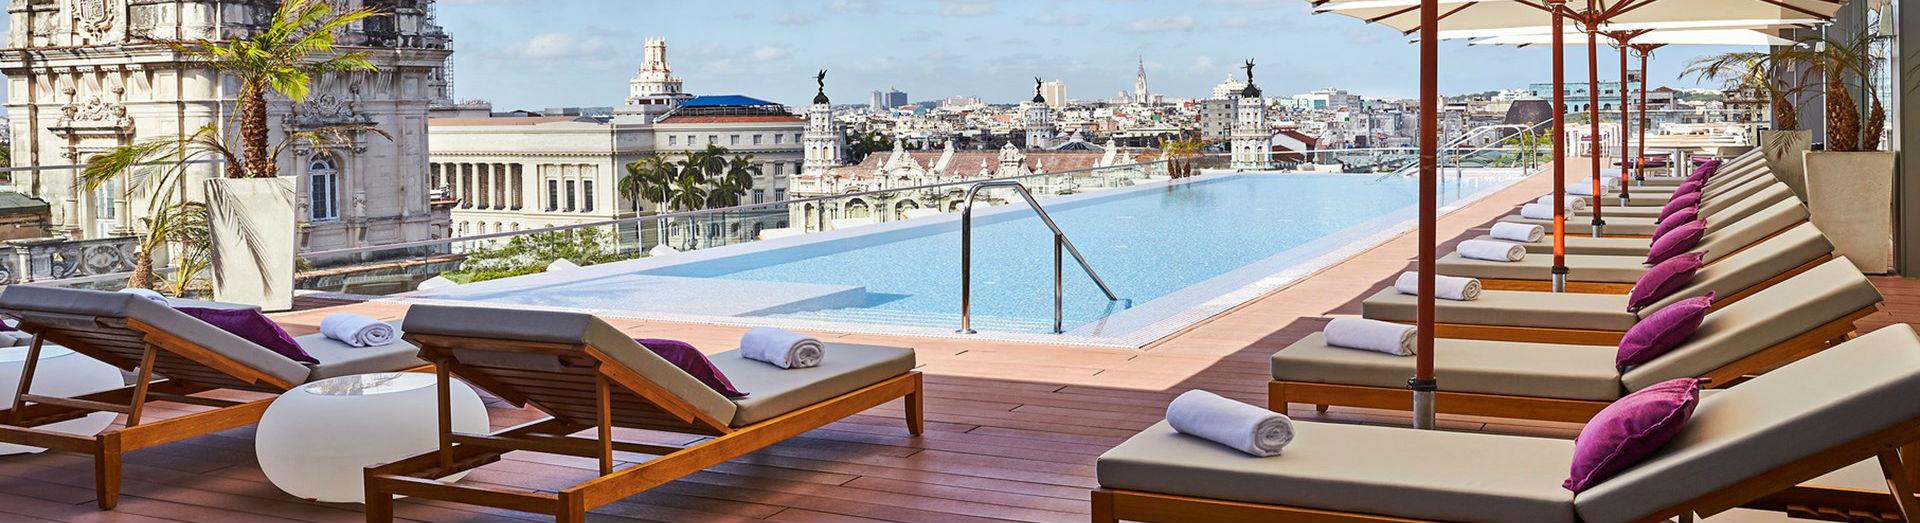 Pool Bella Habana Day Time at the Gran Hotel Manzana Kempinski La Habana